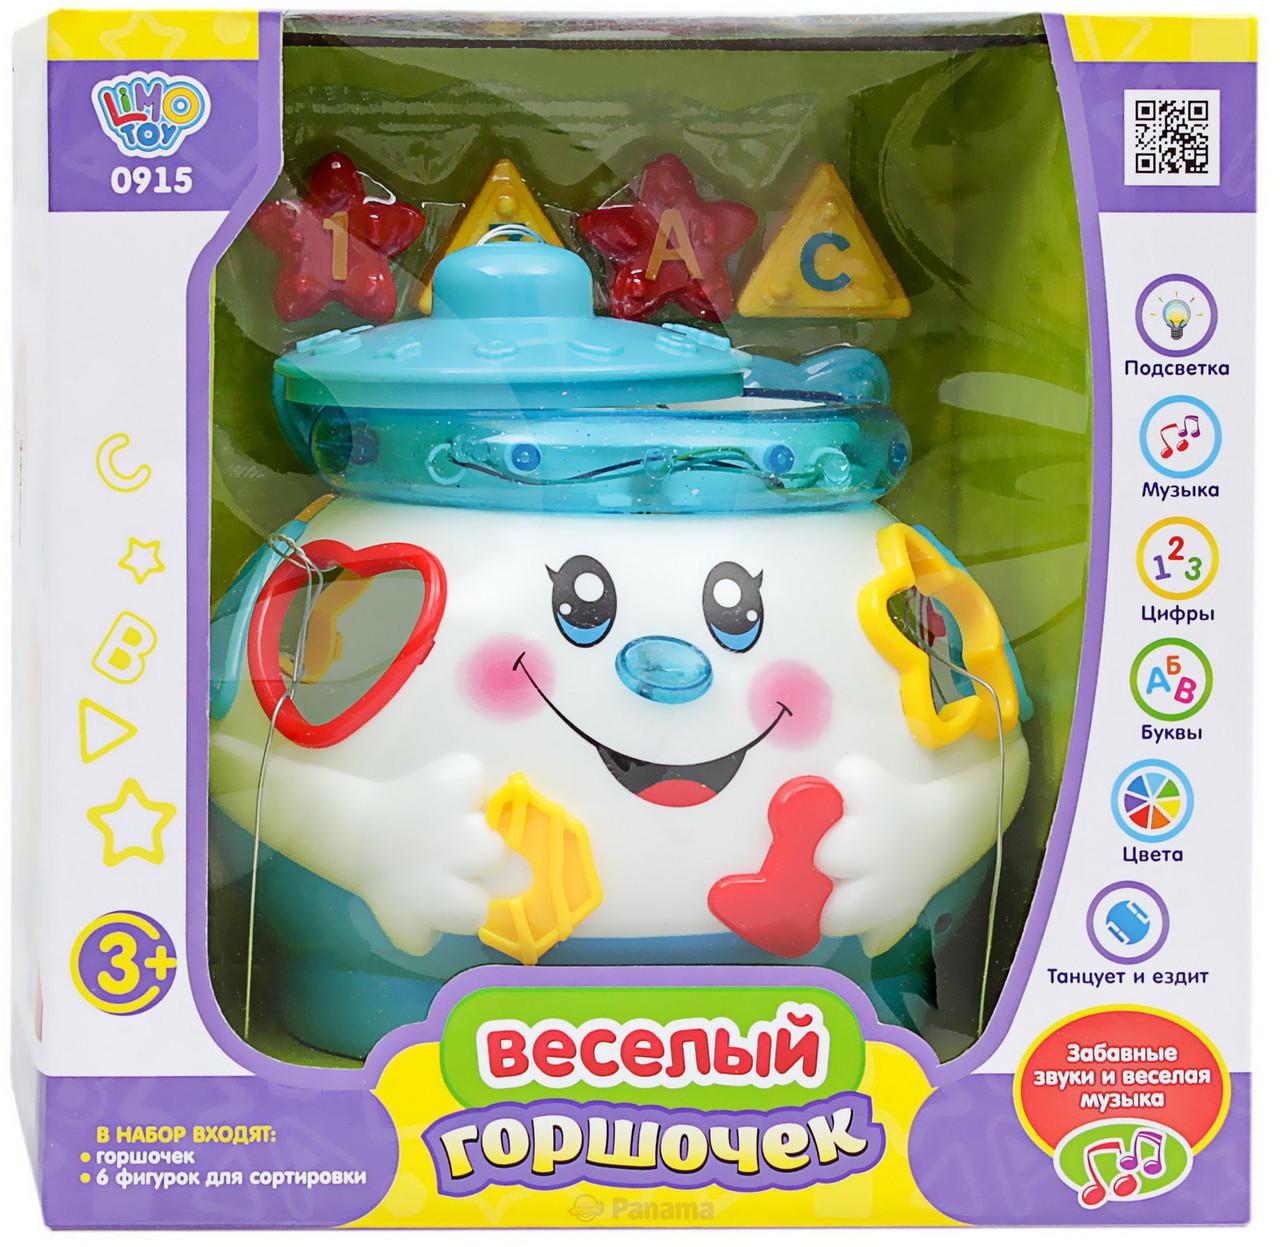 Розвиваюча іграшка-сортер Горщик Limo Toy